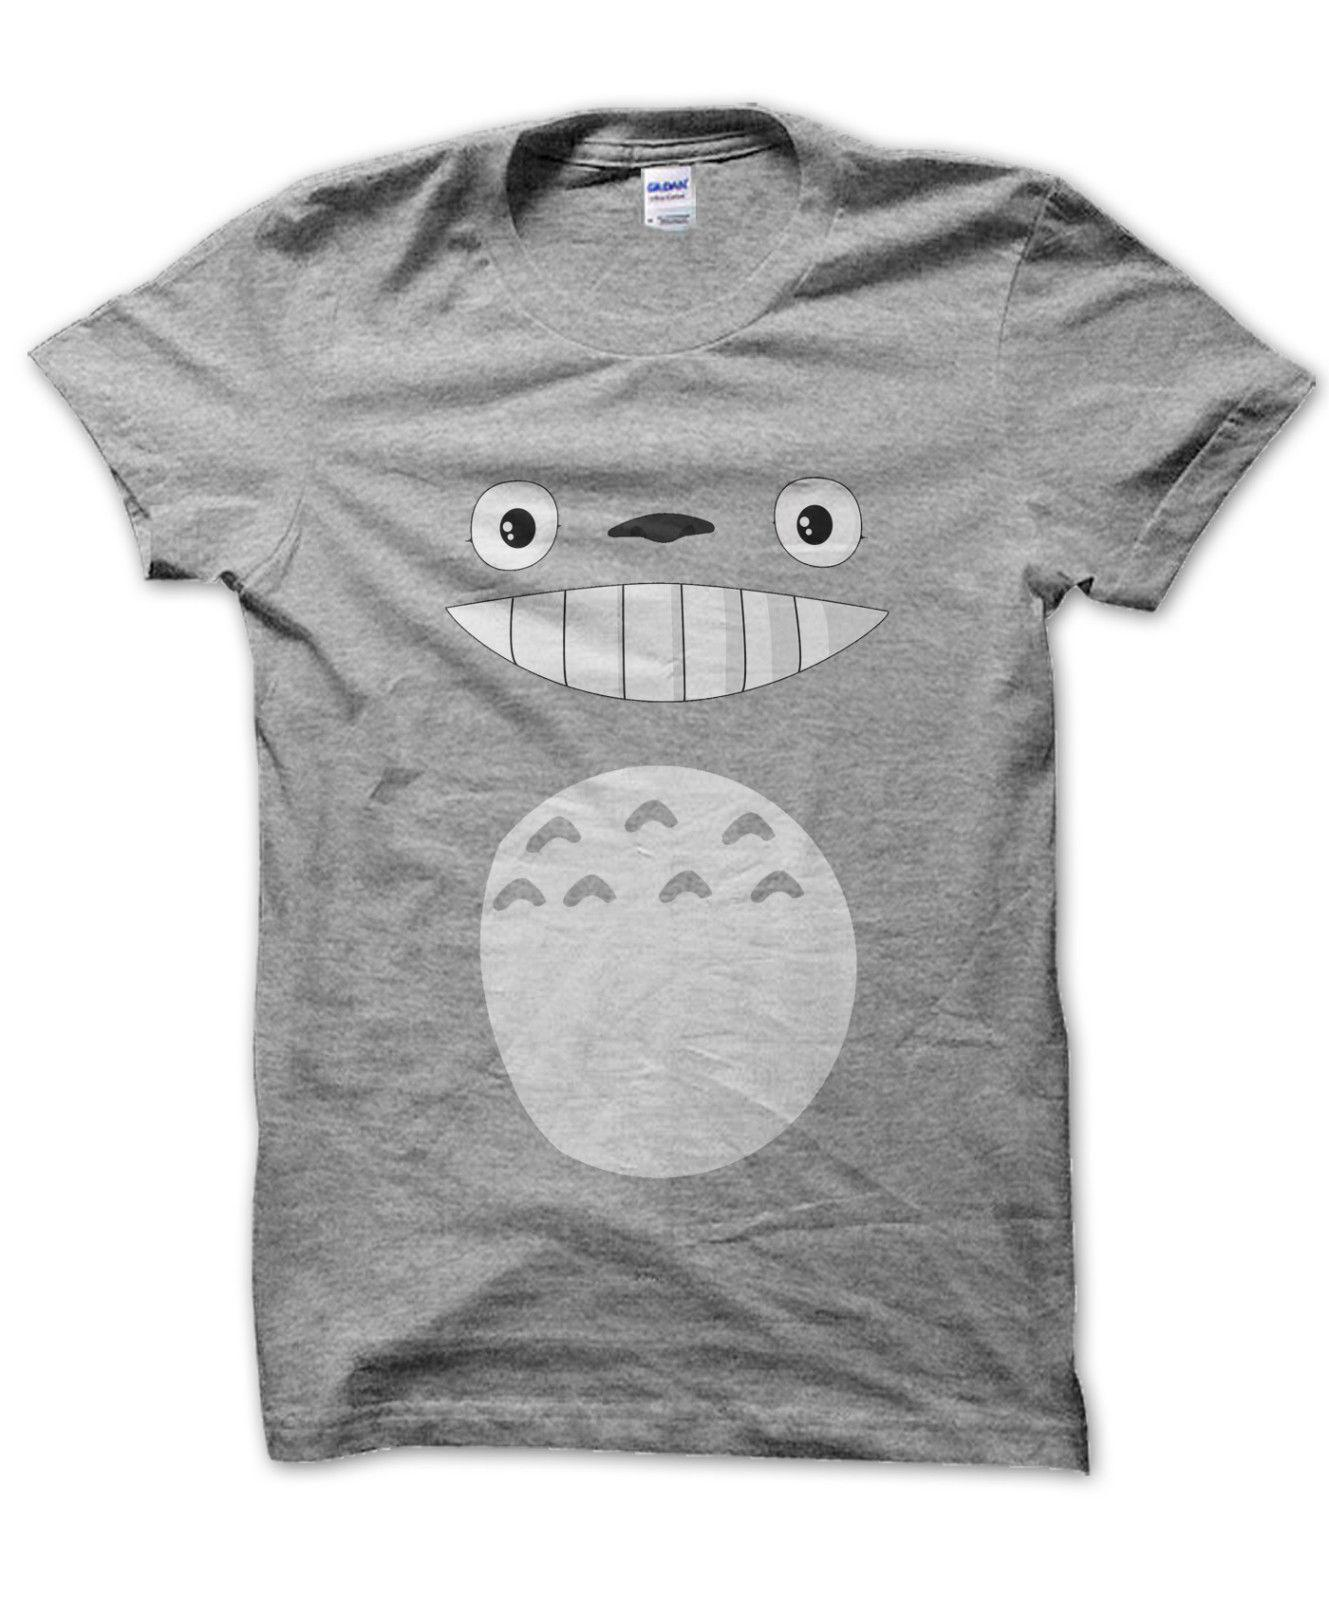 1b5c6552bef1e Totoro Face And Body Unisex T-shirt Studio Ghibli Cute Present Anime Gift  Men 2019 Summer Round Neck Men's T Shirt. Store-wide Discount